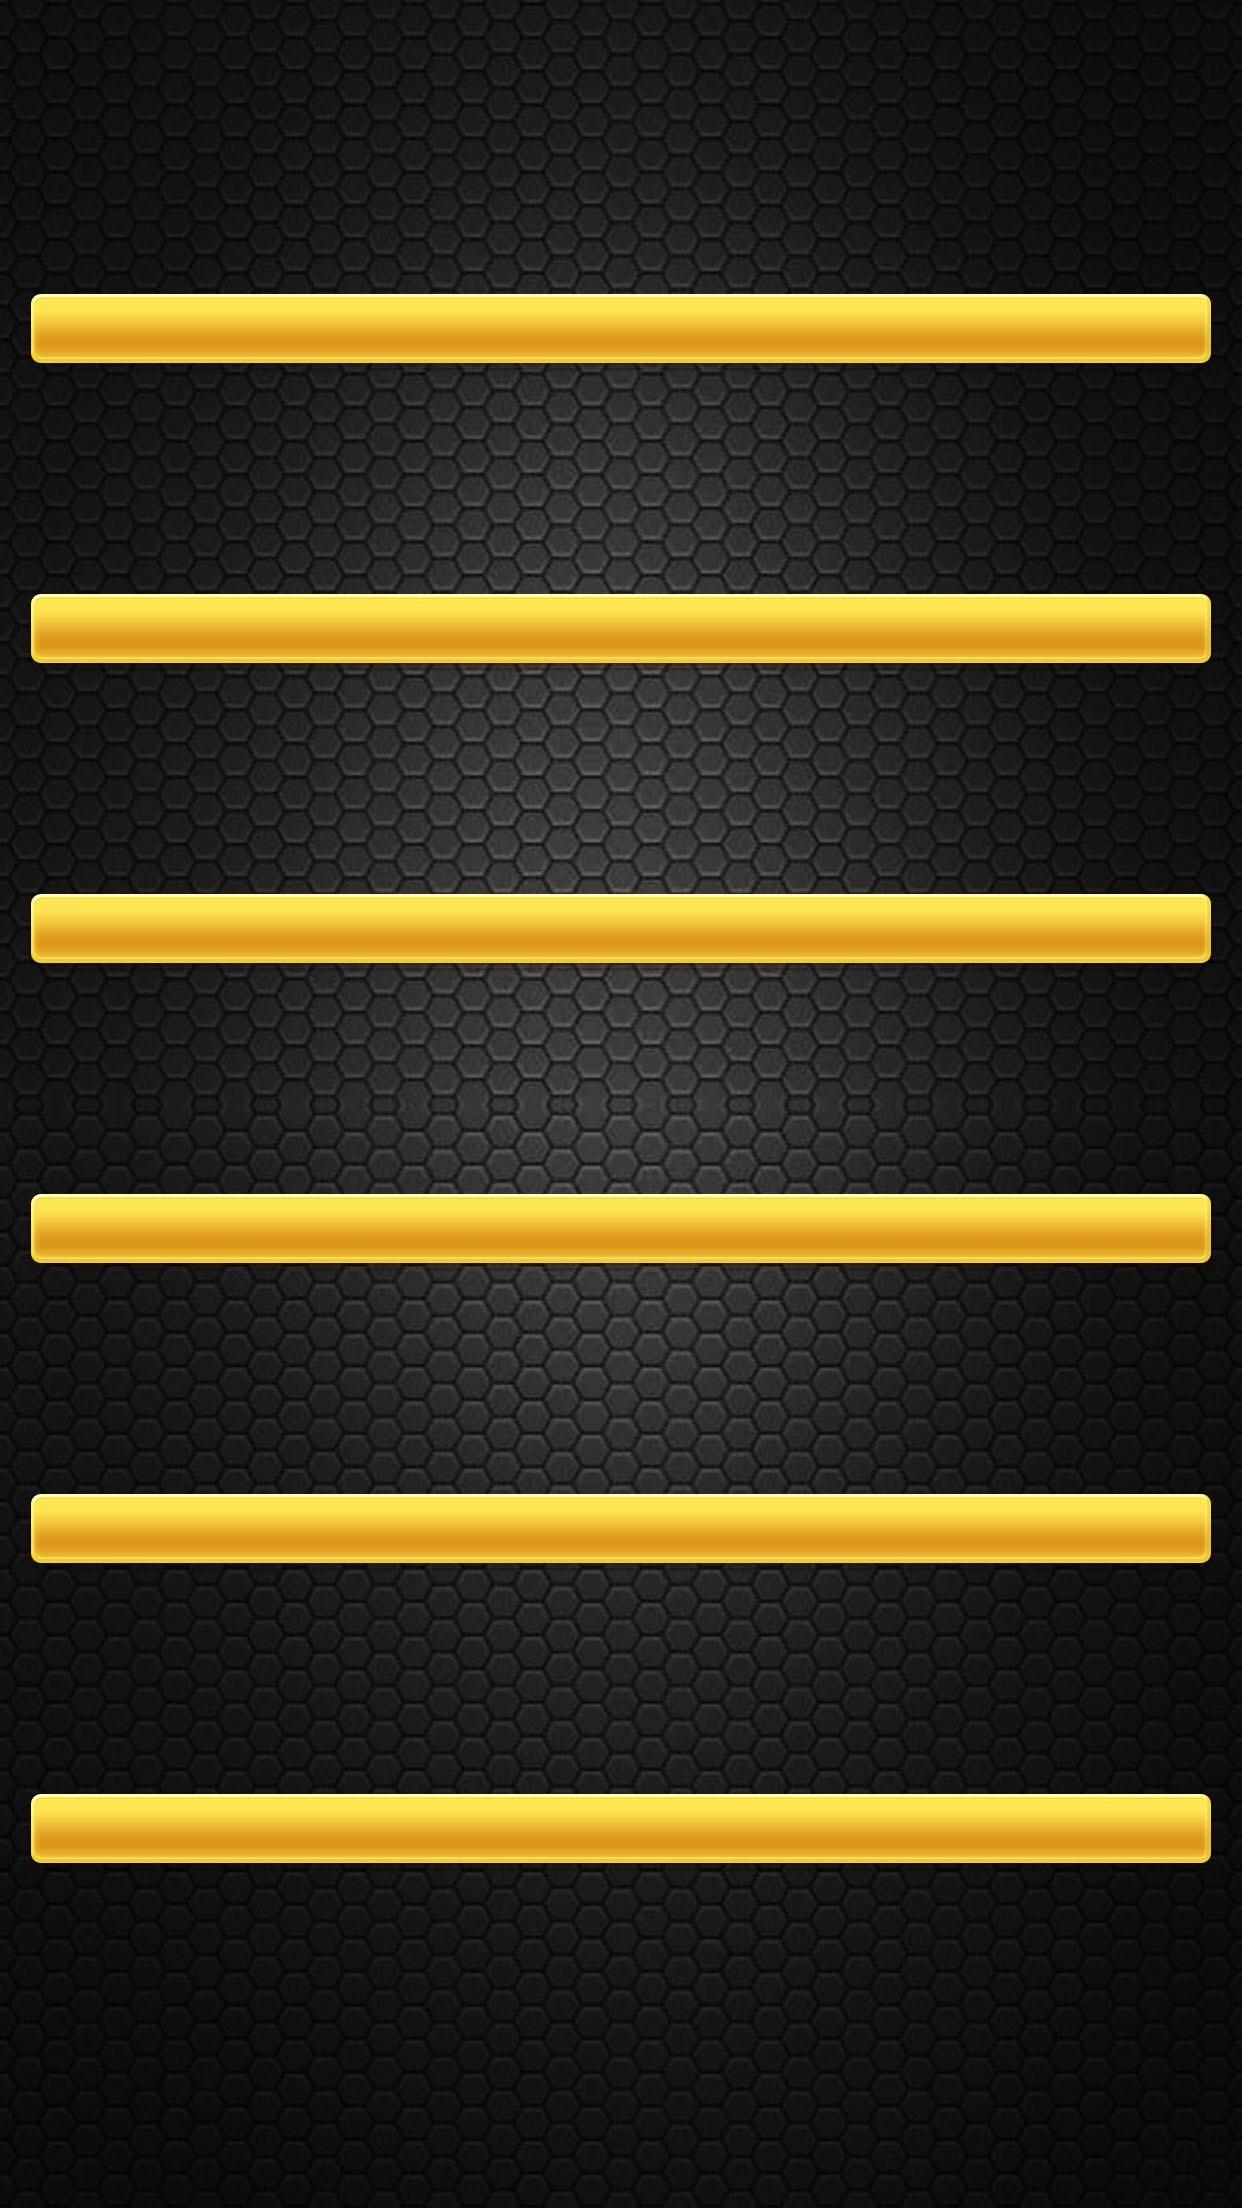 Shelves Simple Black Yellow Minimalistic HD iPhone